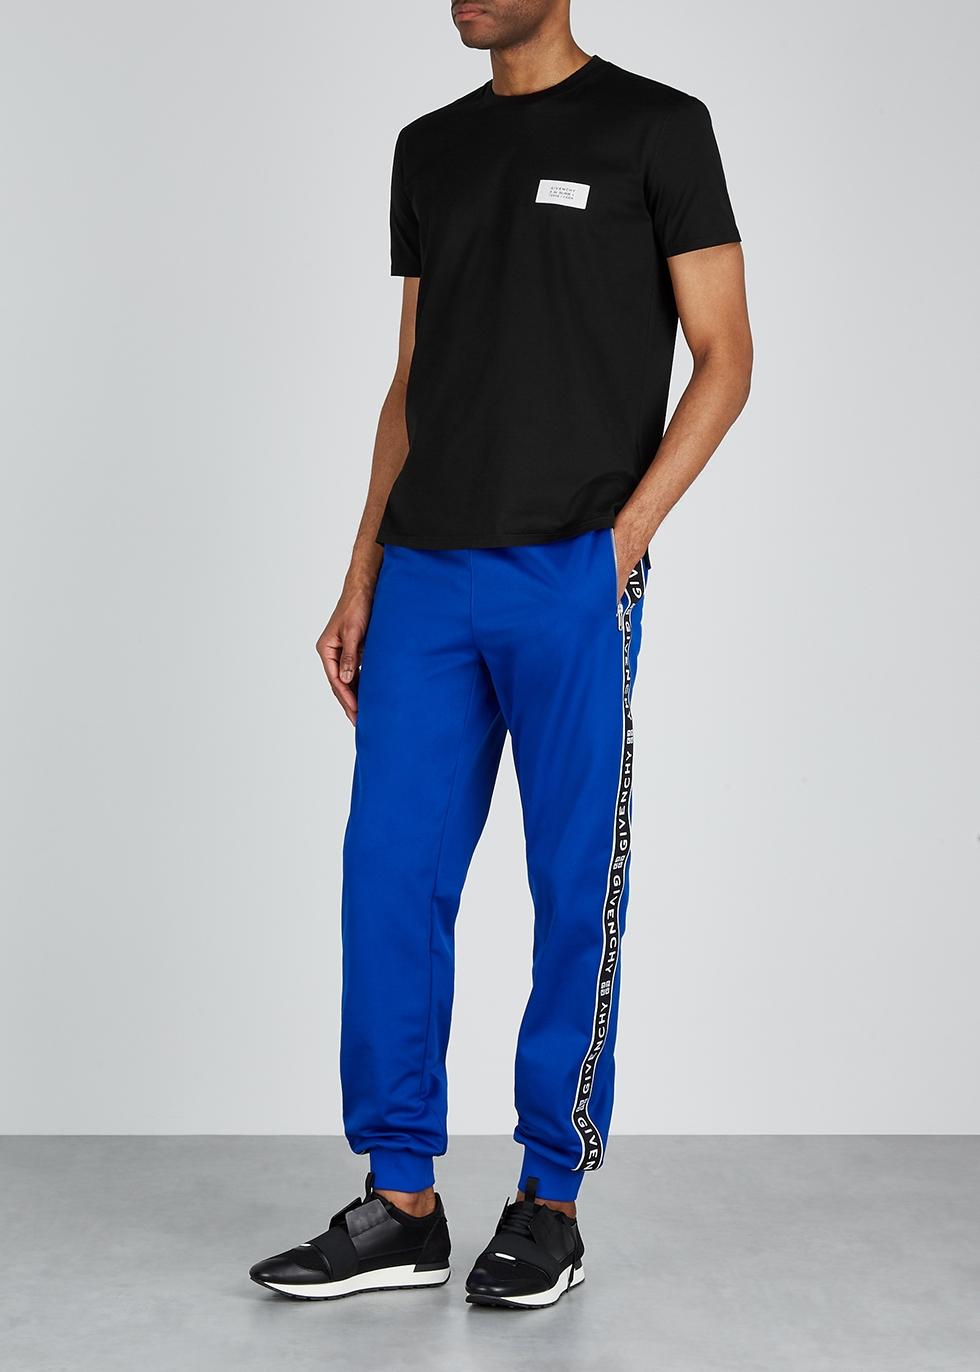 Black cotton T-shirt - Givenchy